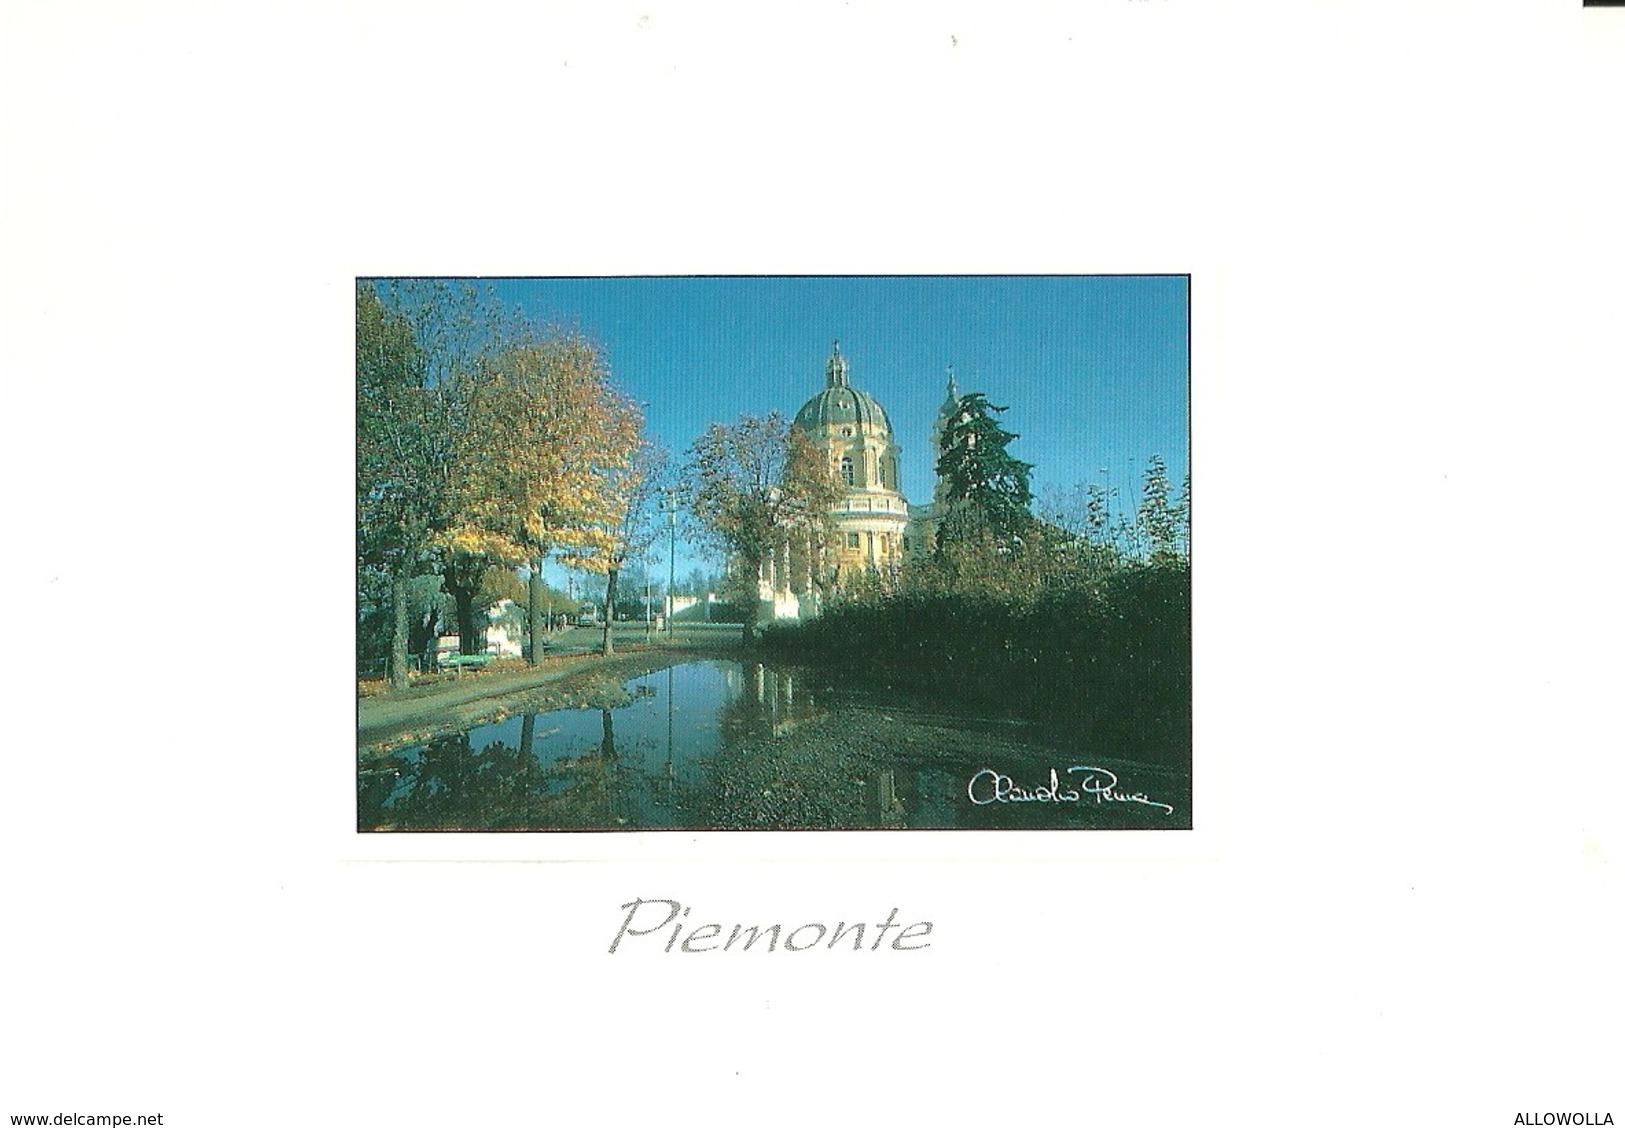 "3008 "" PIEMONTE - TORINO - BASILICA DI SUPERGA - FOTO DI CLAUDIO PENNA "" CART. POS.OR. NON SPED. - Churches"